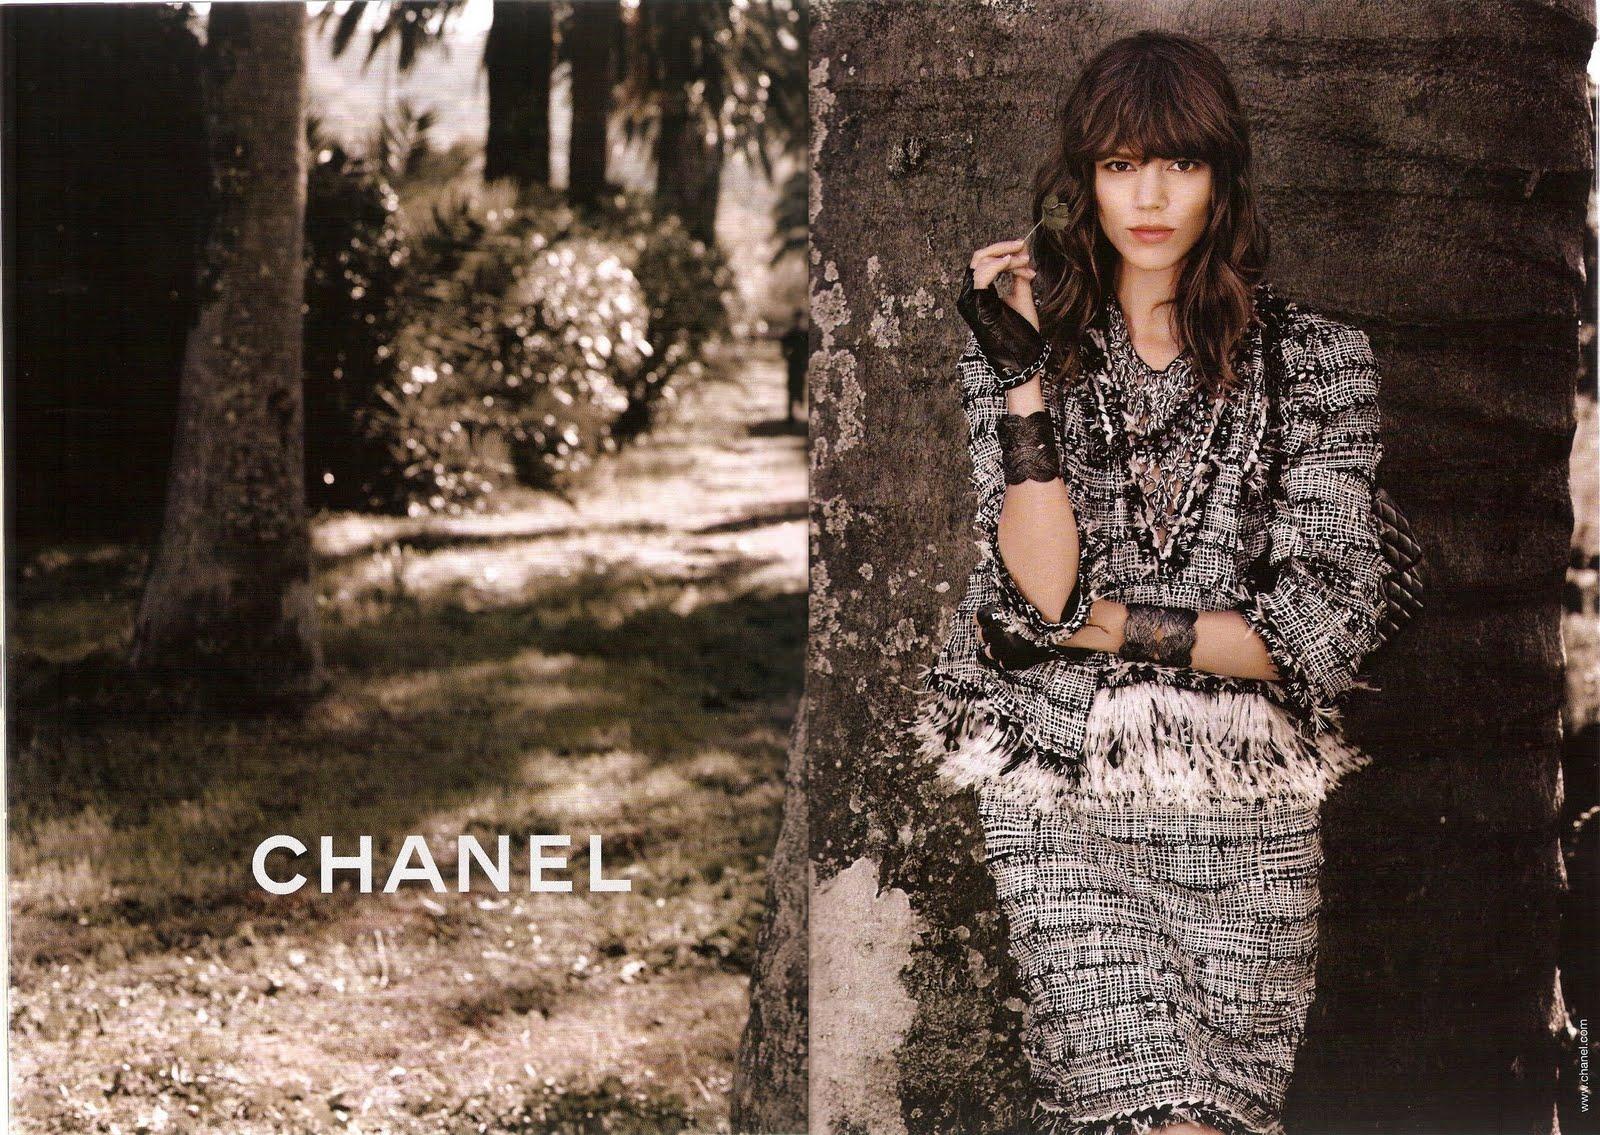 Chanel-Spring-Summer-2011-Campaign-4.jpg